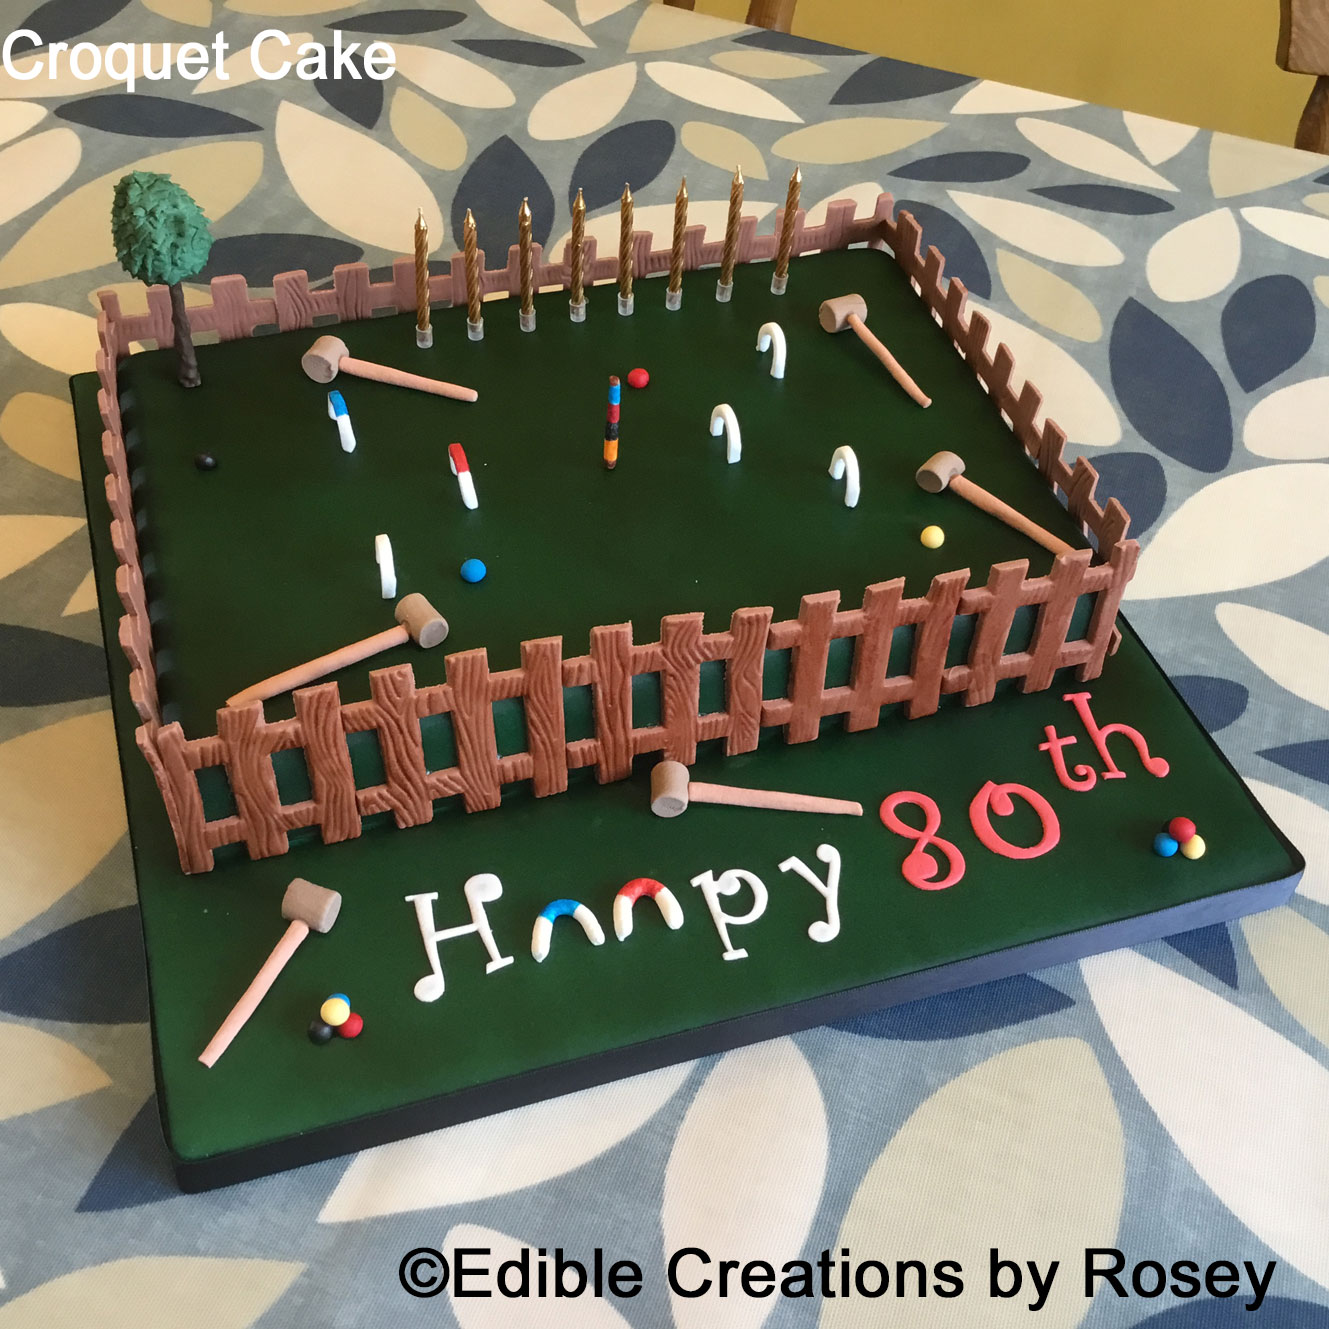 Croquet Cake